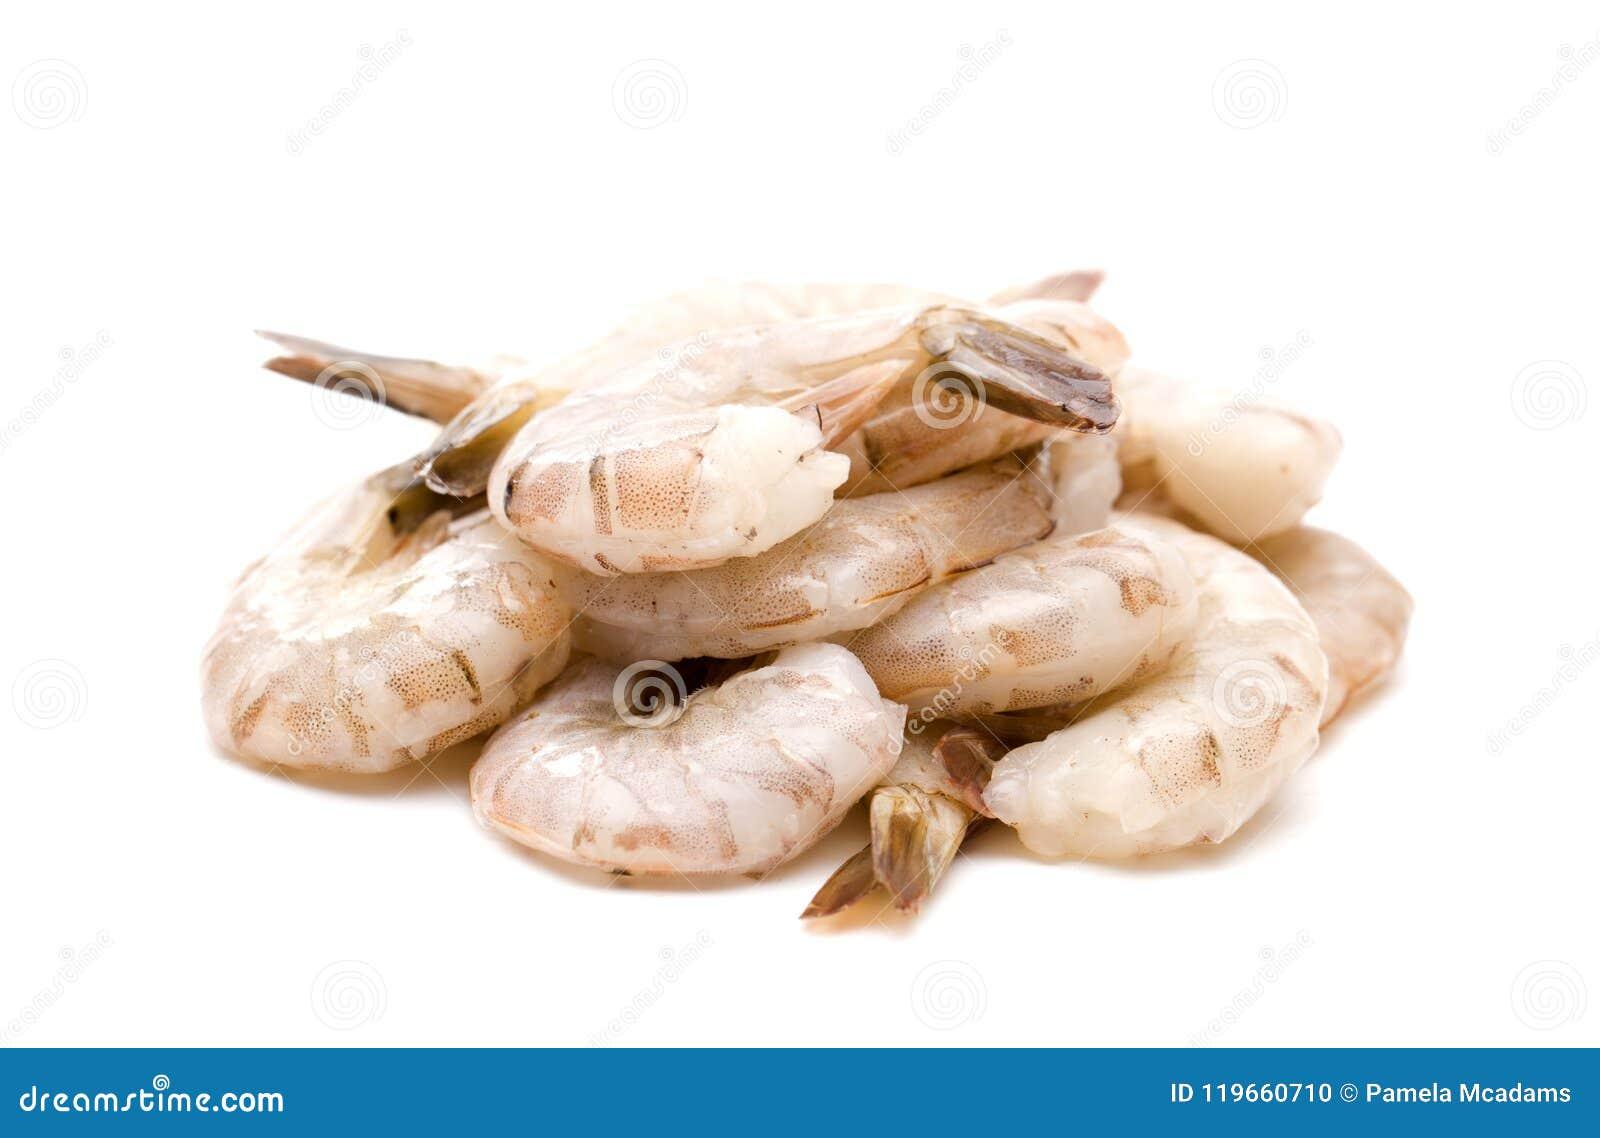 Raw Jumbo Shrimp Stock Photo Image Of Heap Shrimp 119660710